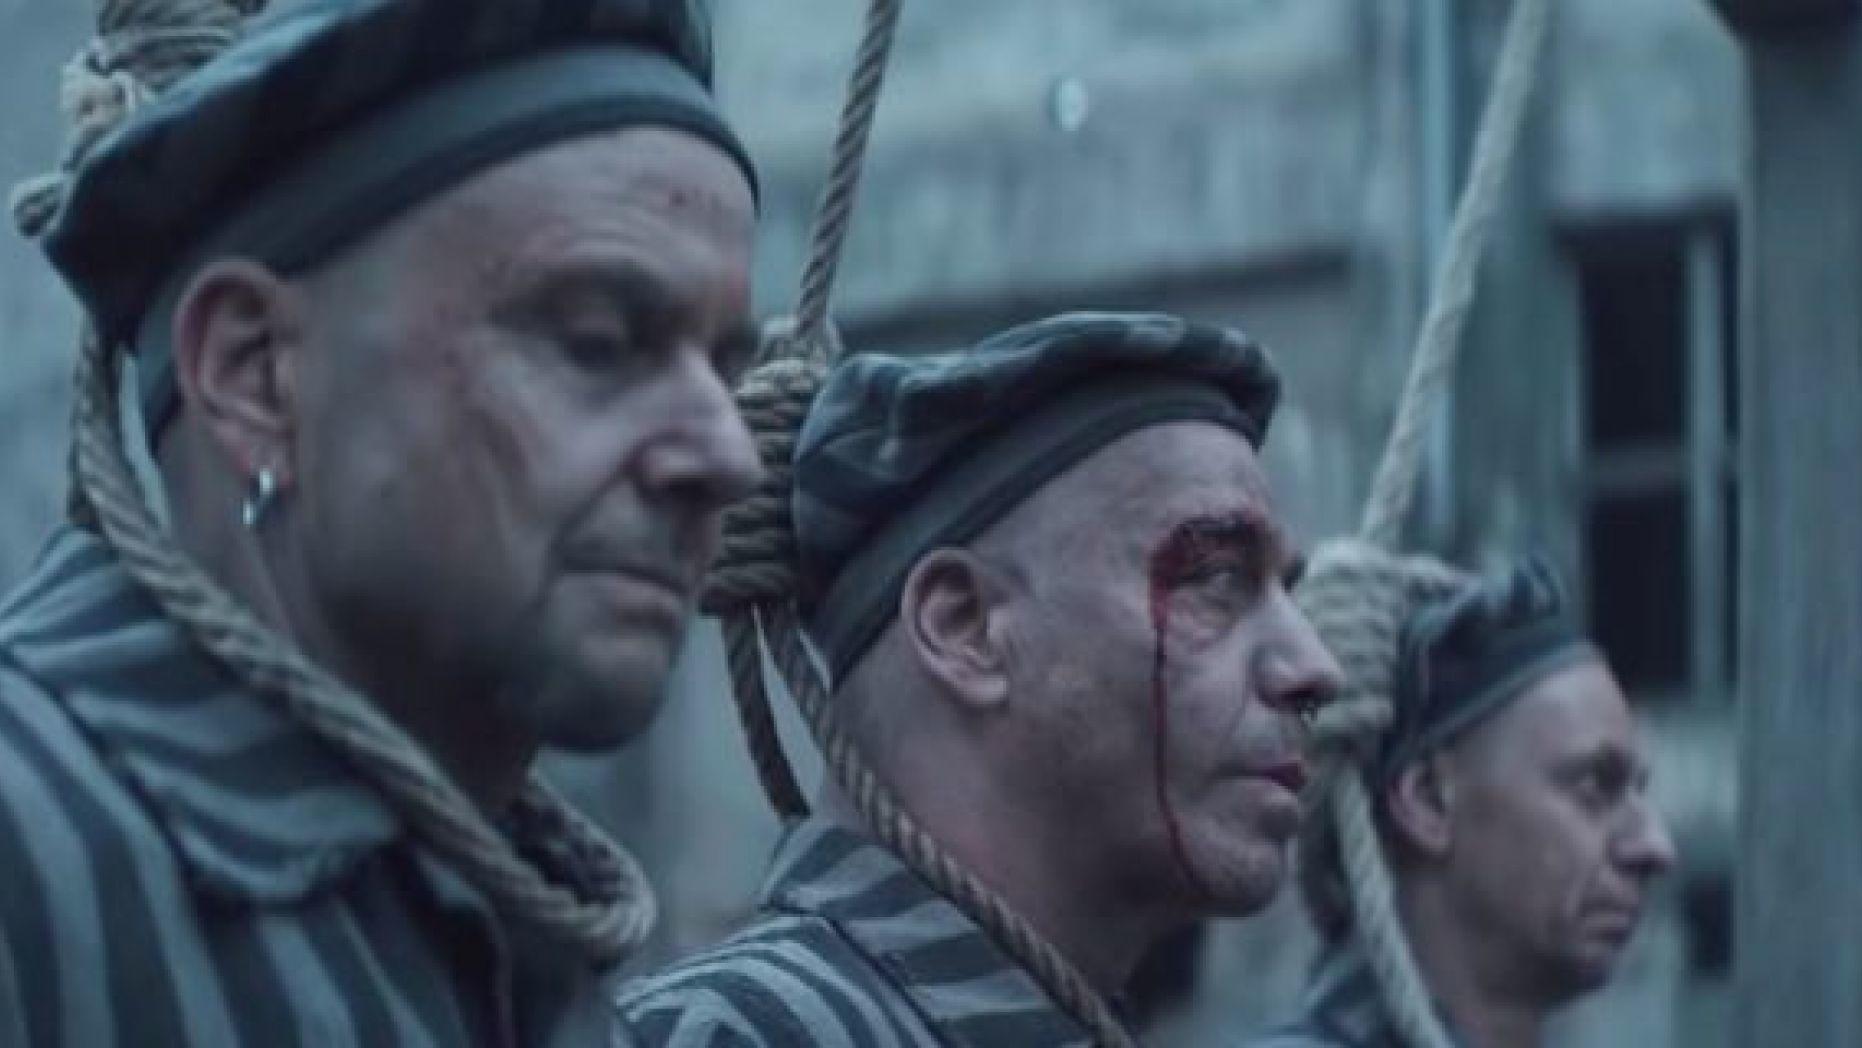 Rammstein Germania videoclip